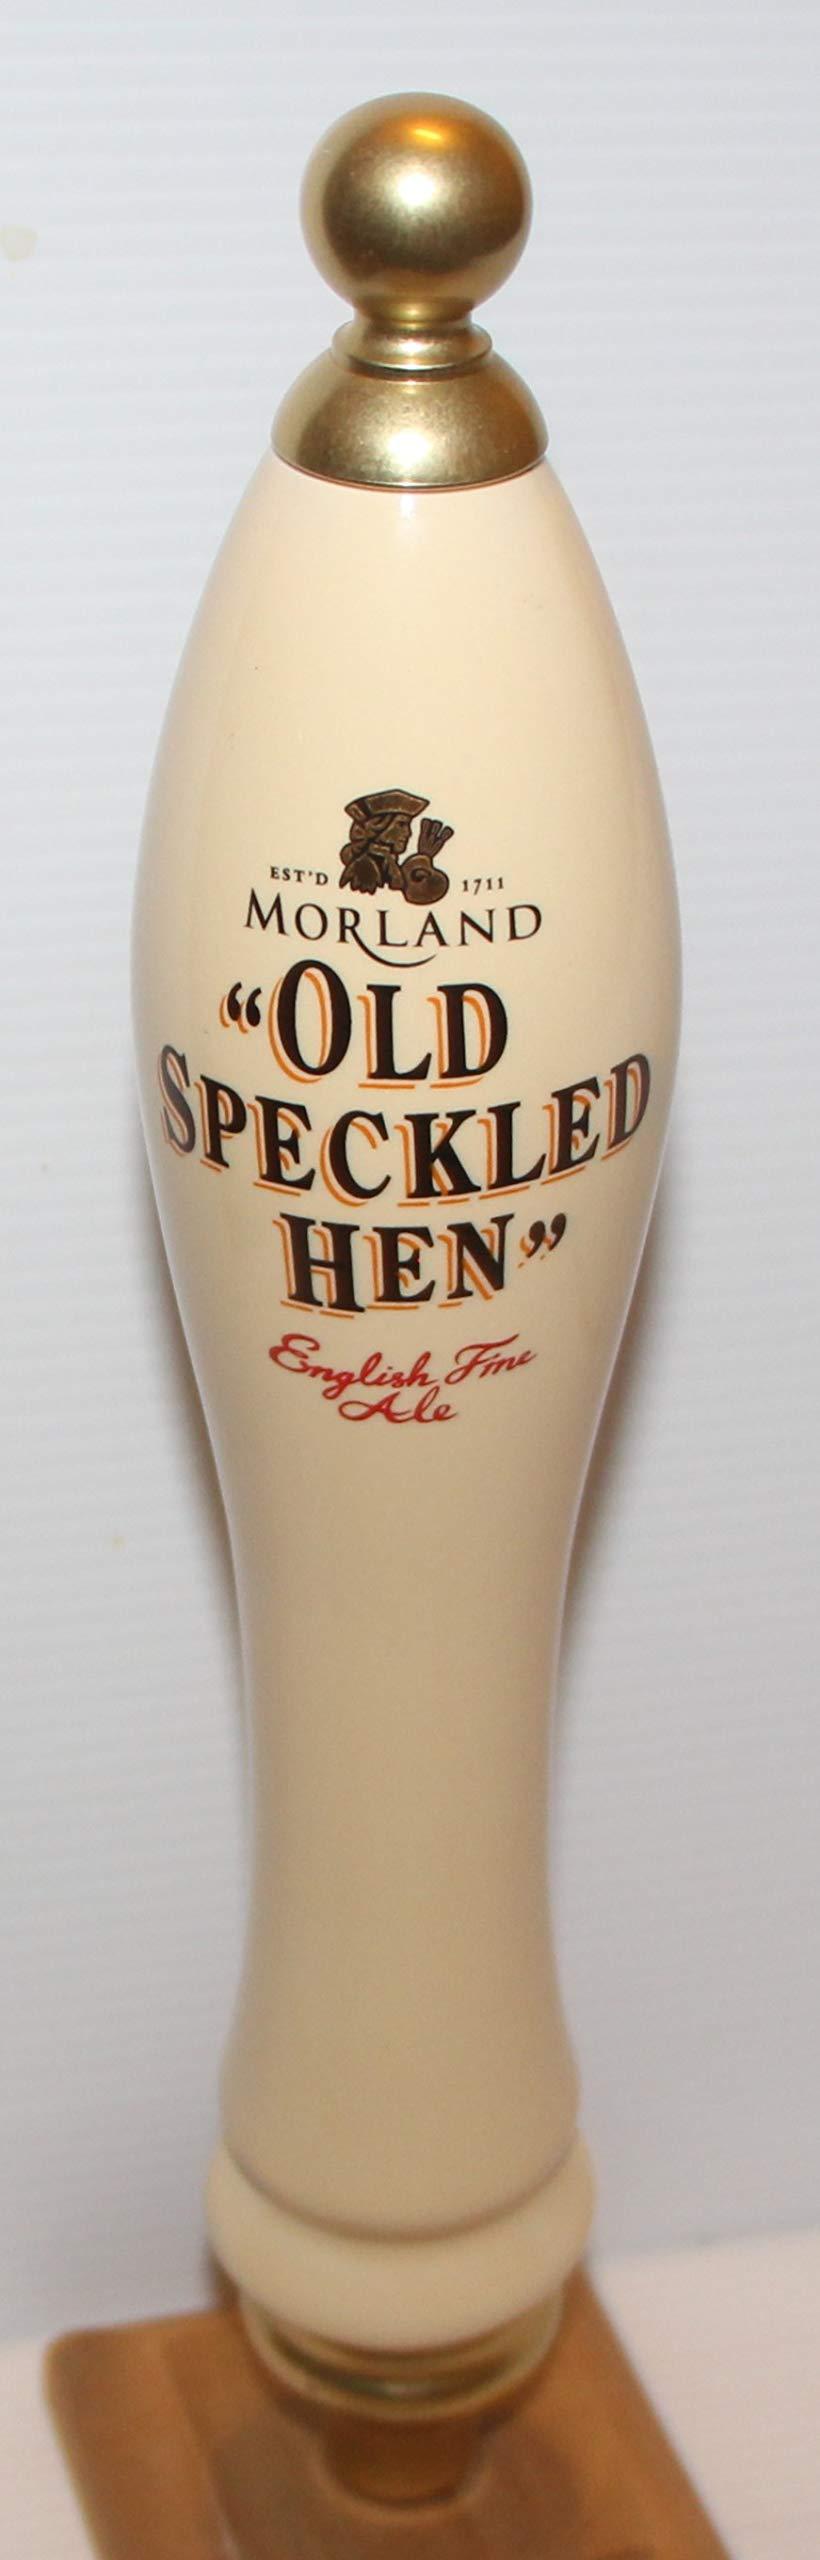 Morland Old Speckled Hen Tap Handle marker knob 12'' pub style